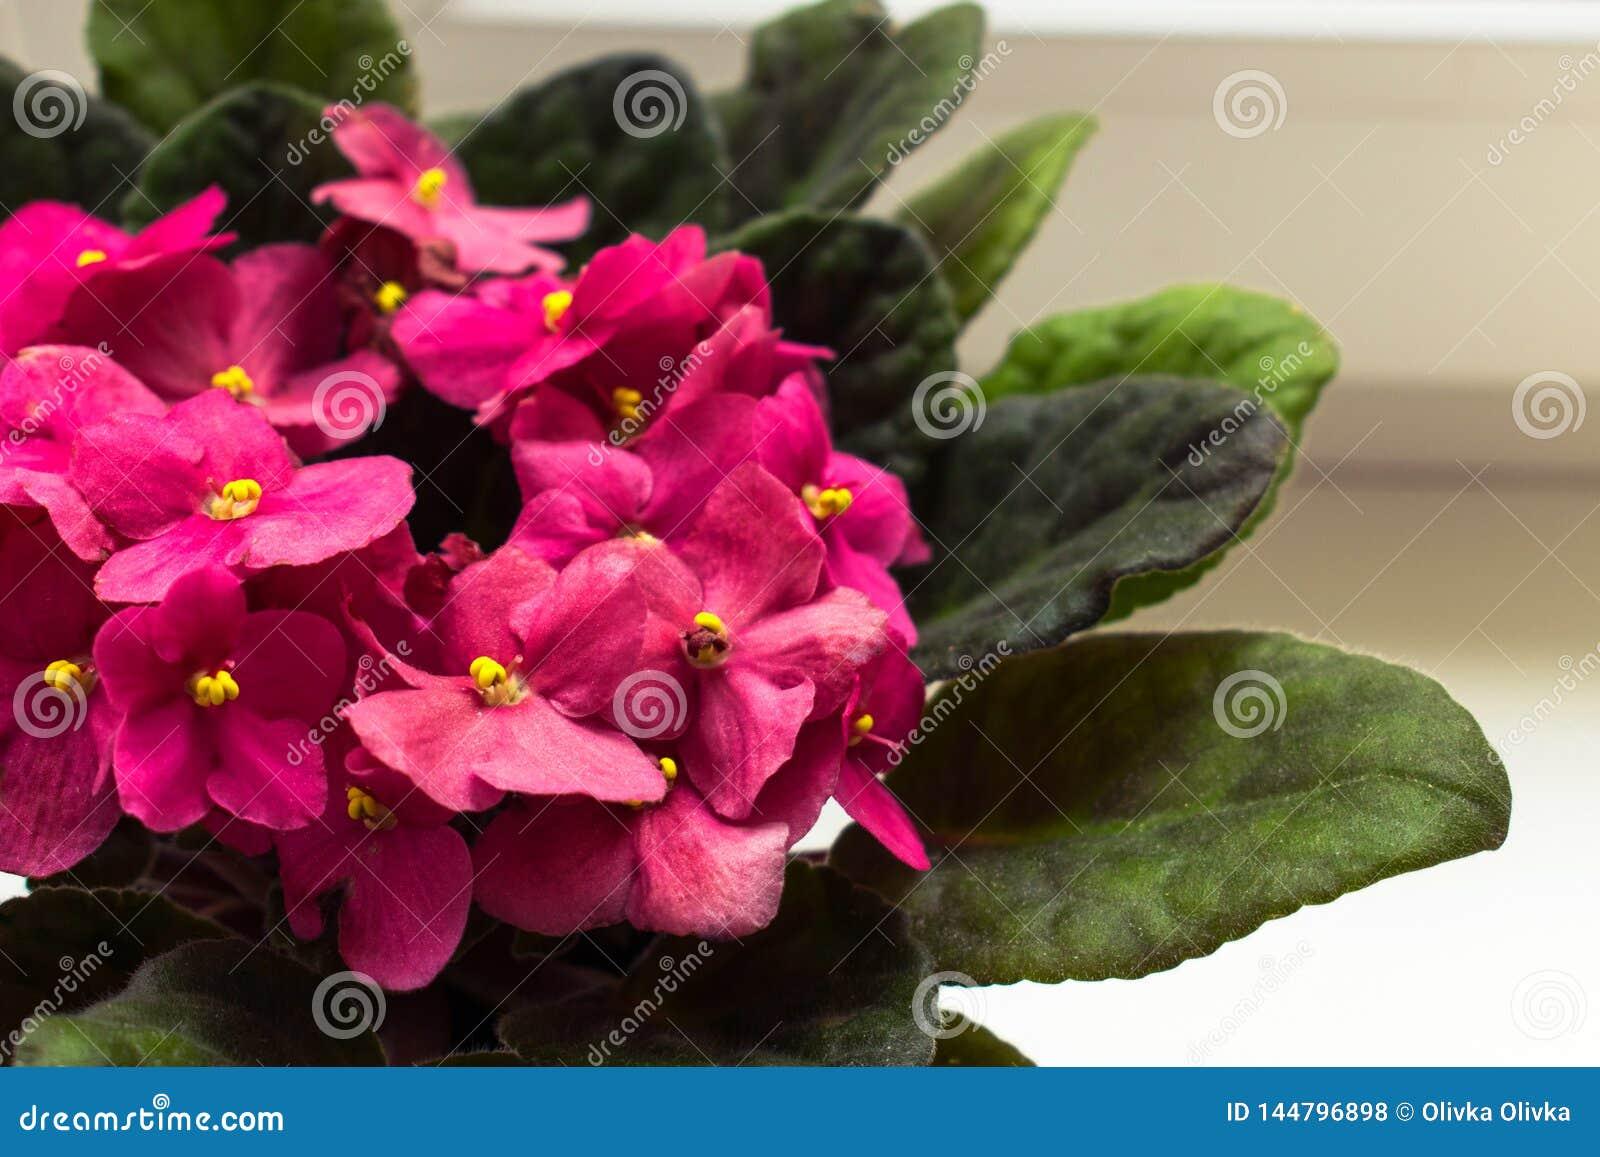 Purple flowers of Saintpaulia, Small pink flower on the window